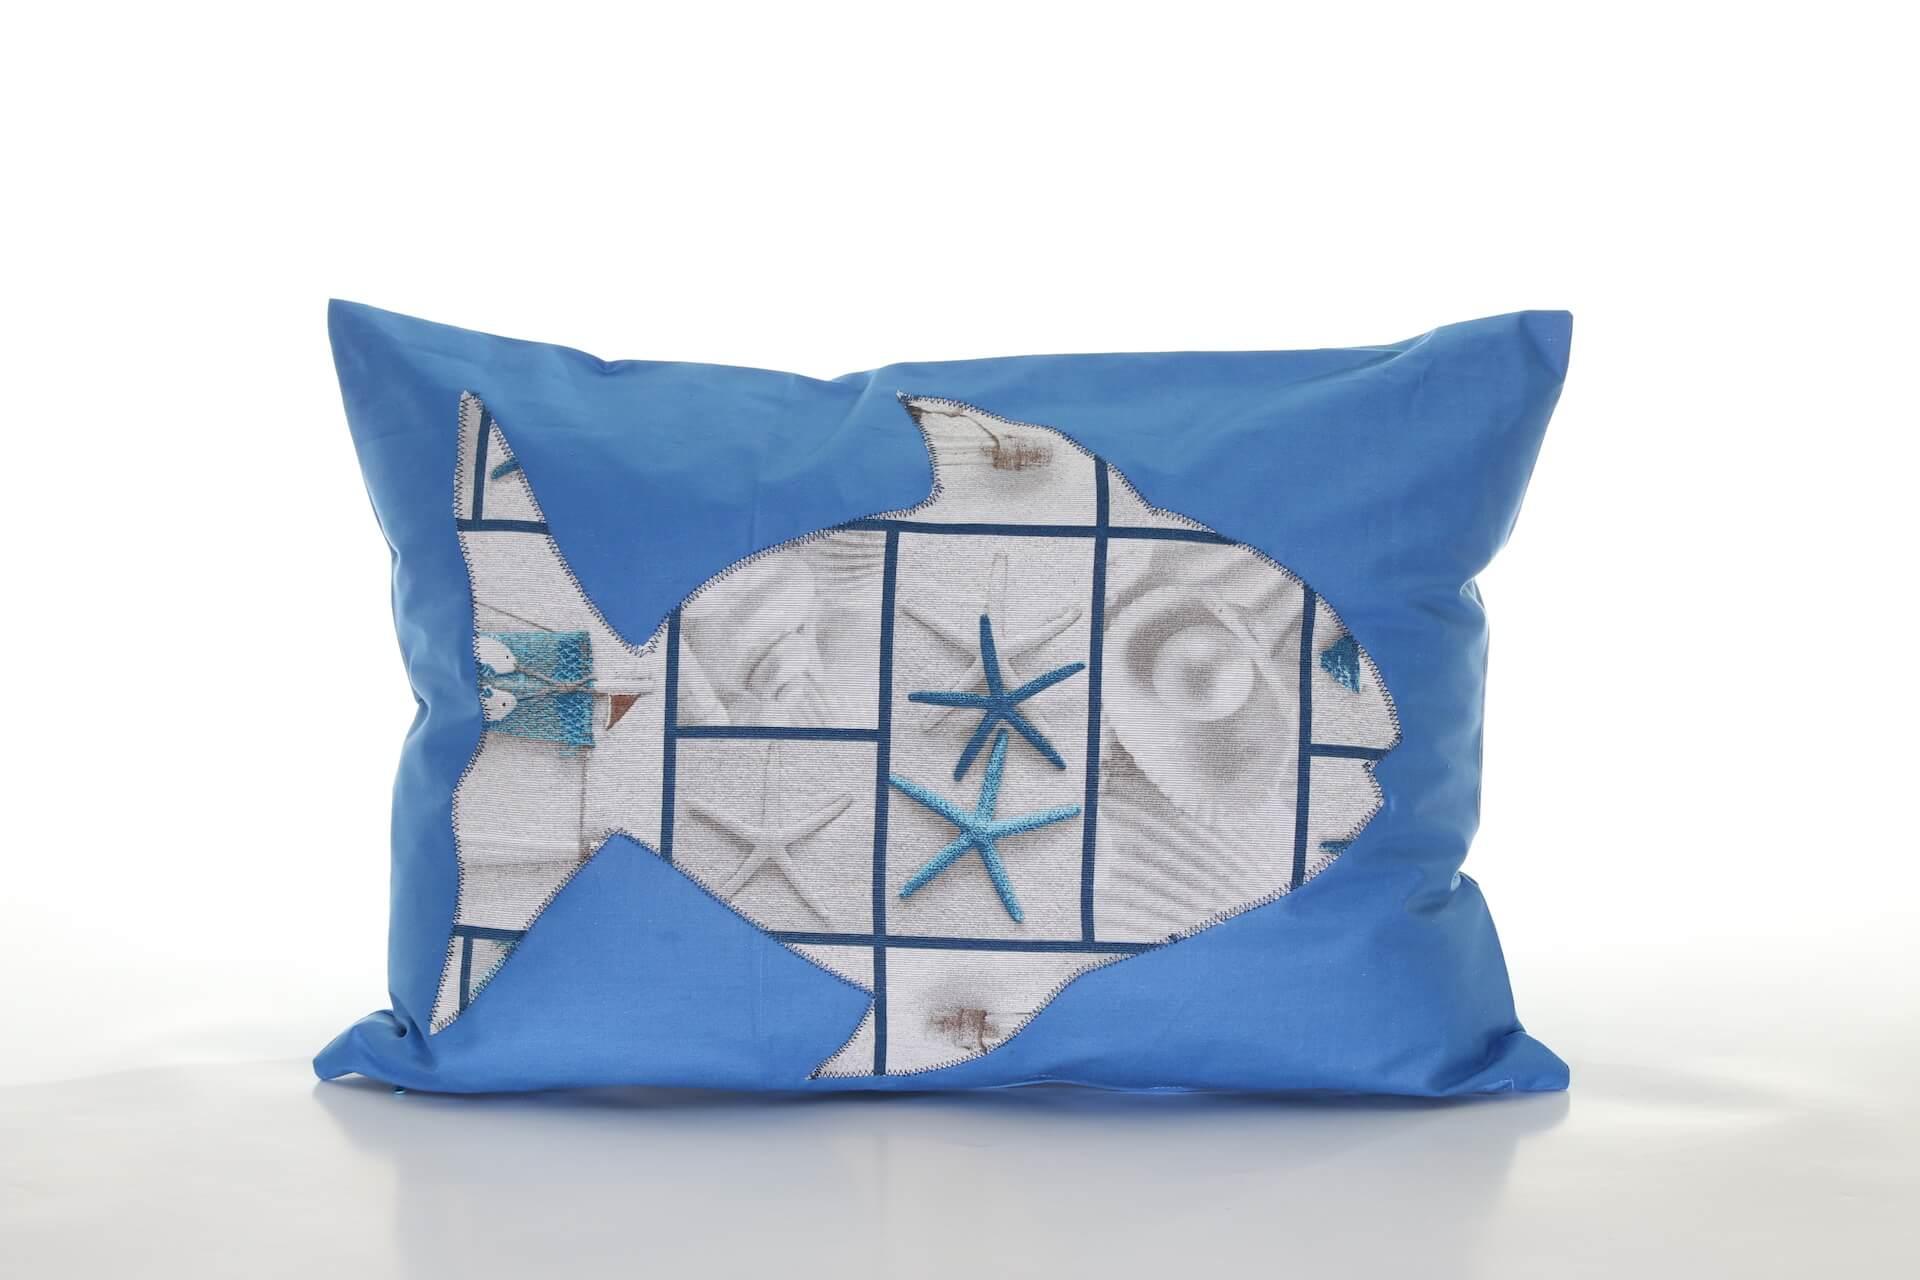 Handmade decorative pillow with fish and starfish